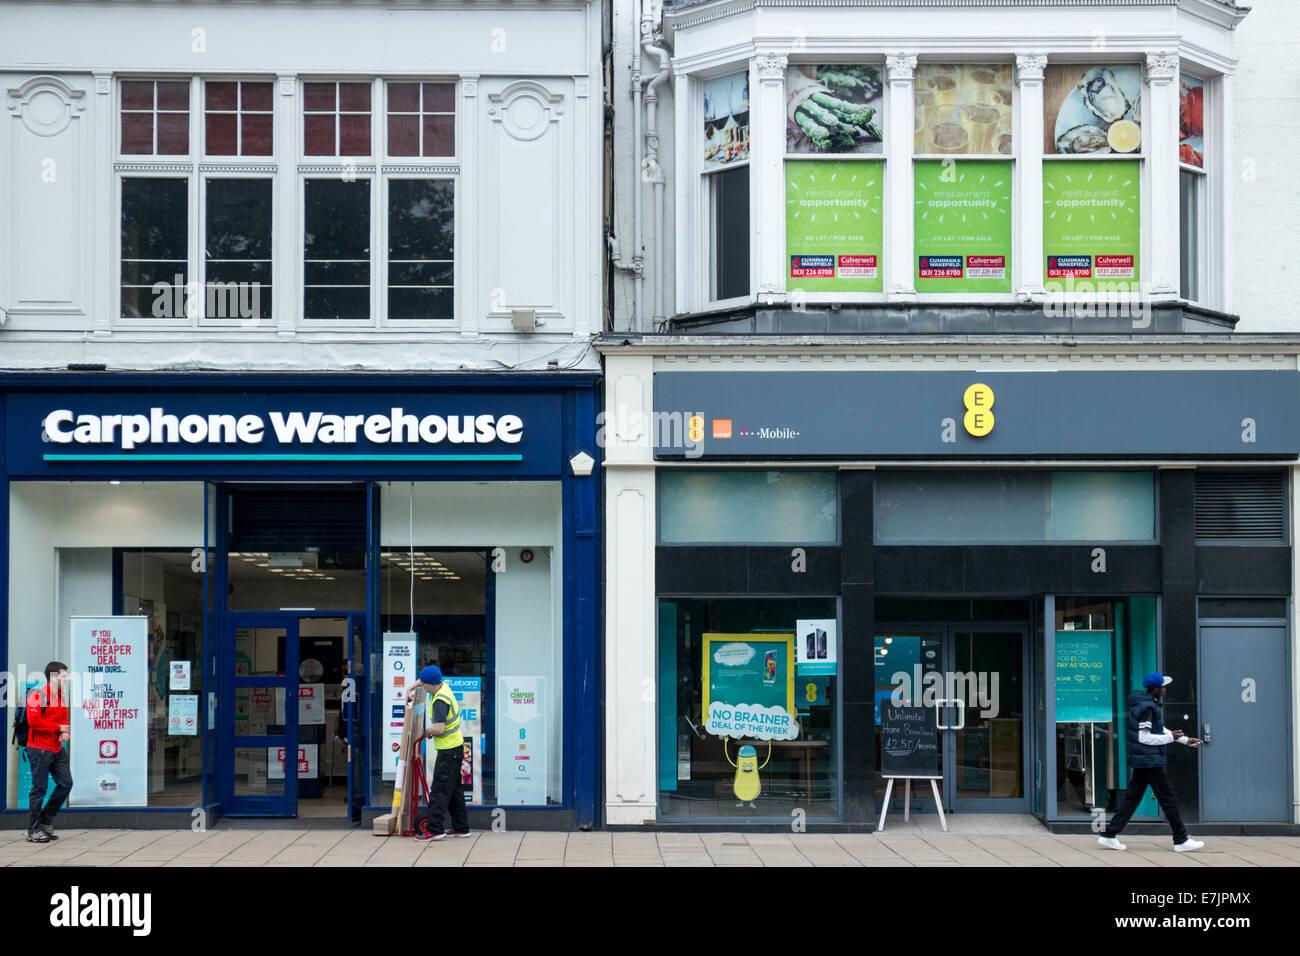 Carphone Warehouse and EE Everything Everwhere mobile phone shops on Princes Street, Edinburgh - Stock Image